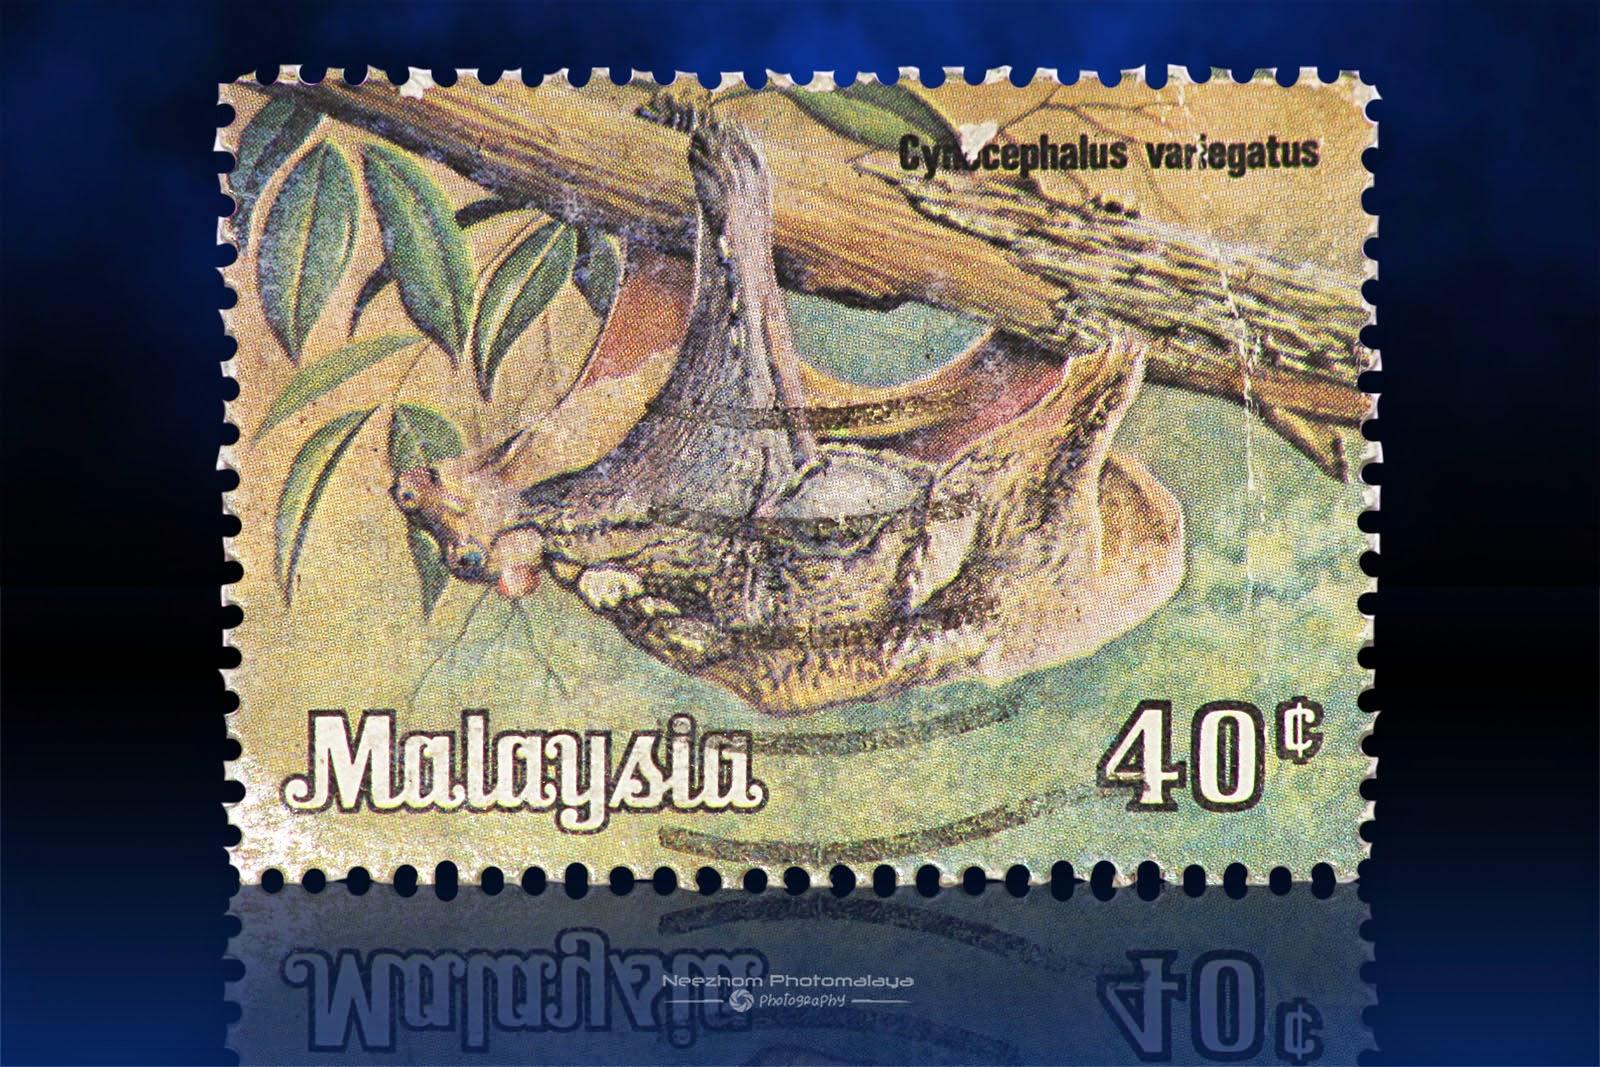 National Animals Series 1979 stamps - 40 Sen Cynocephalus Variegatus